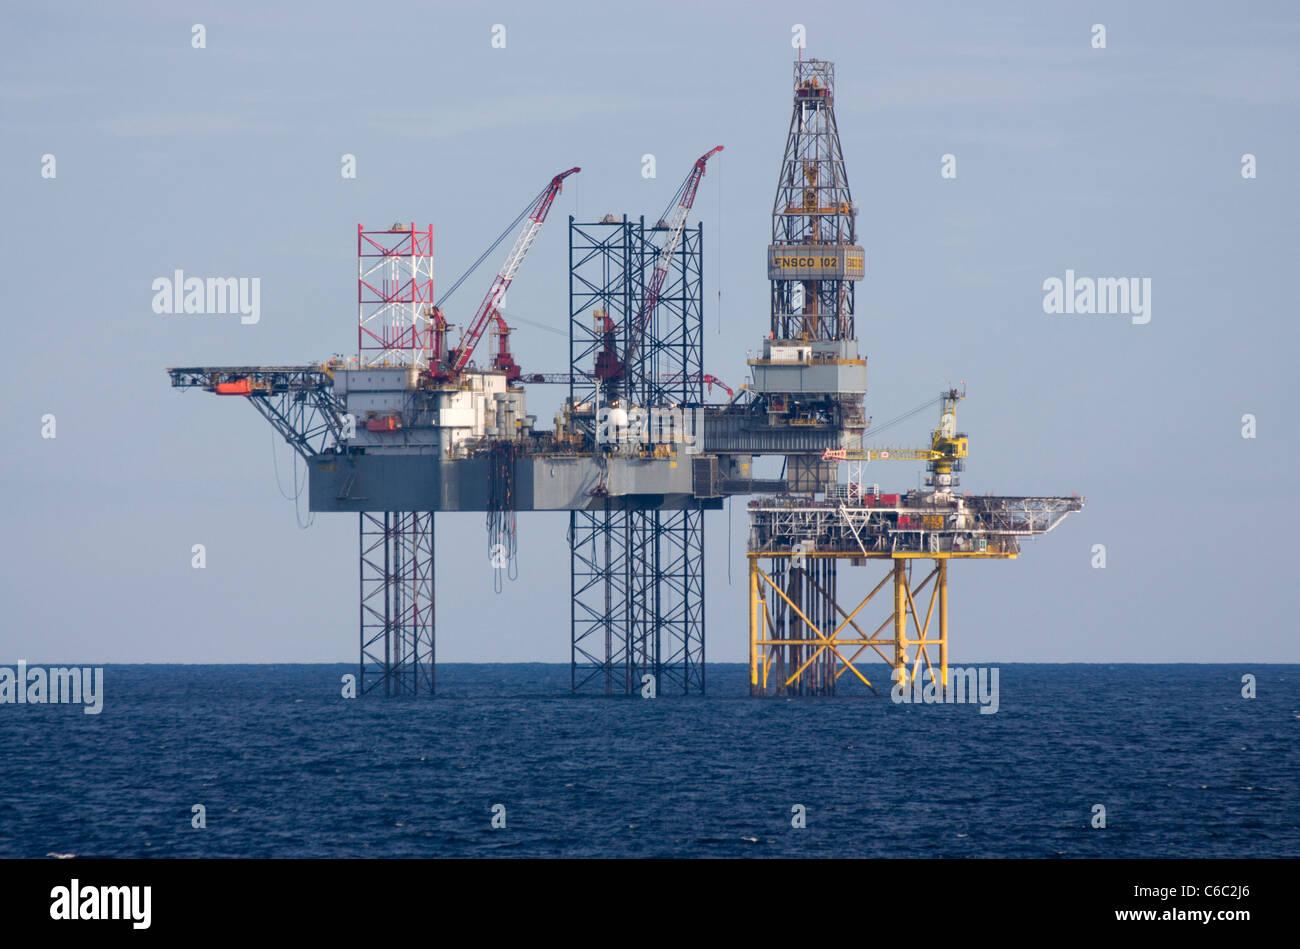 Oil rig  Ensco 102 jackup driling rig North Sea Stock Photo